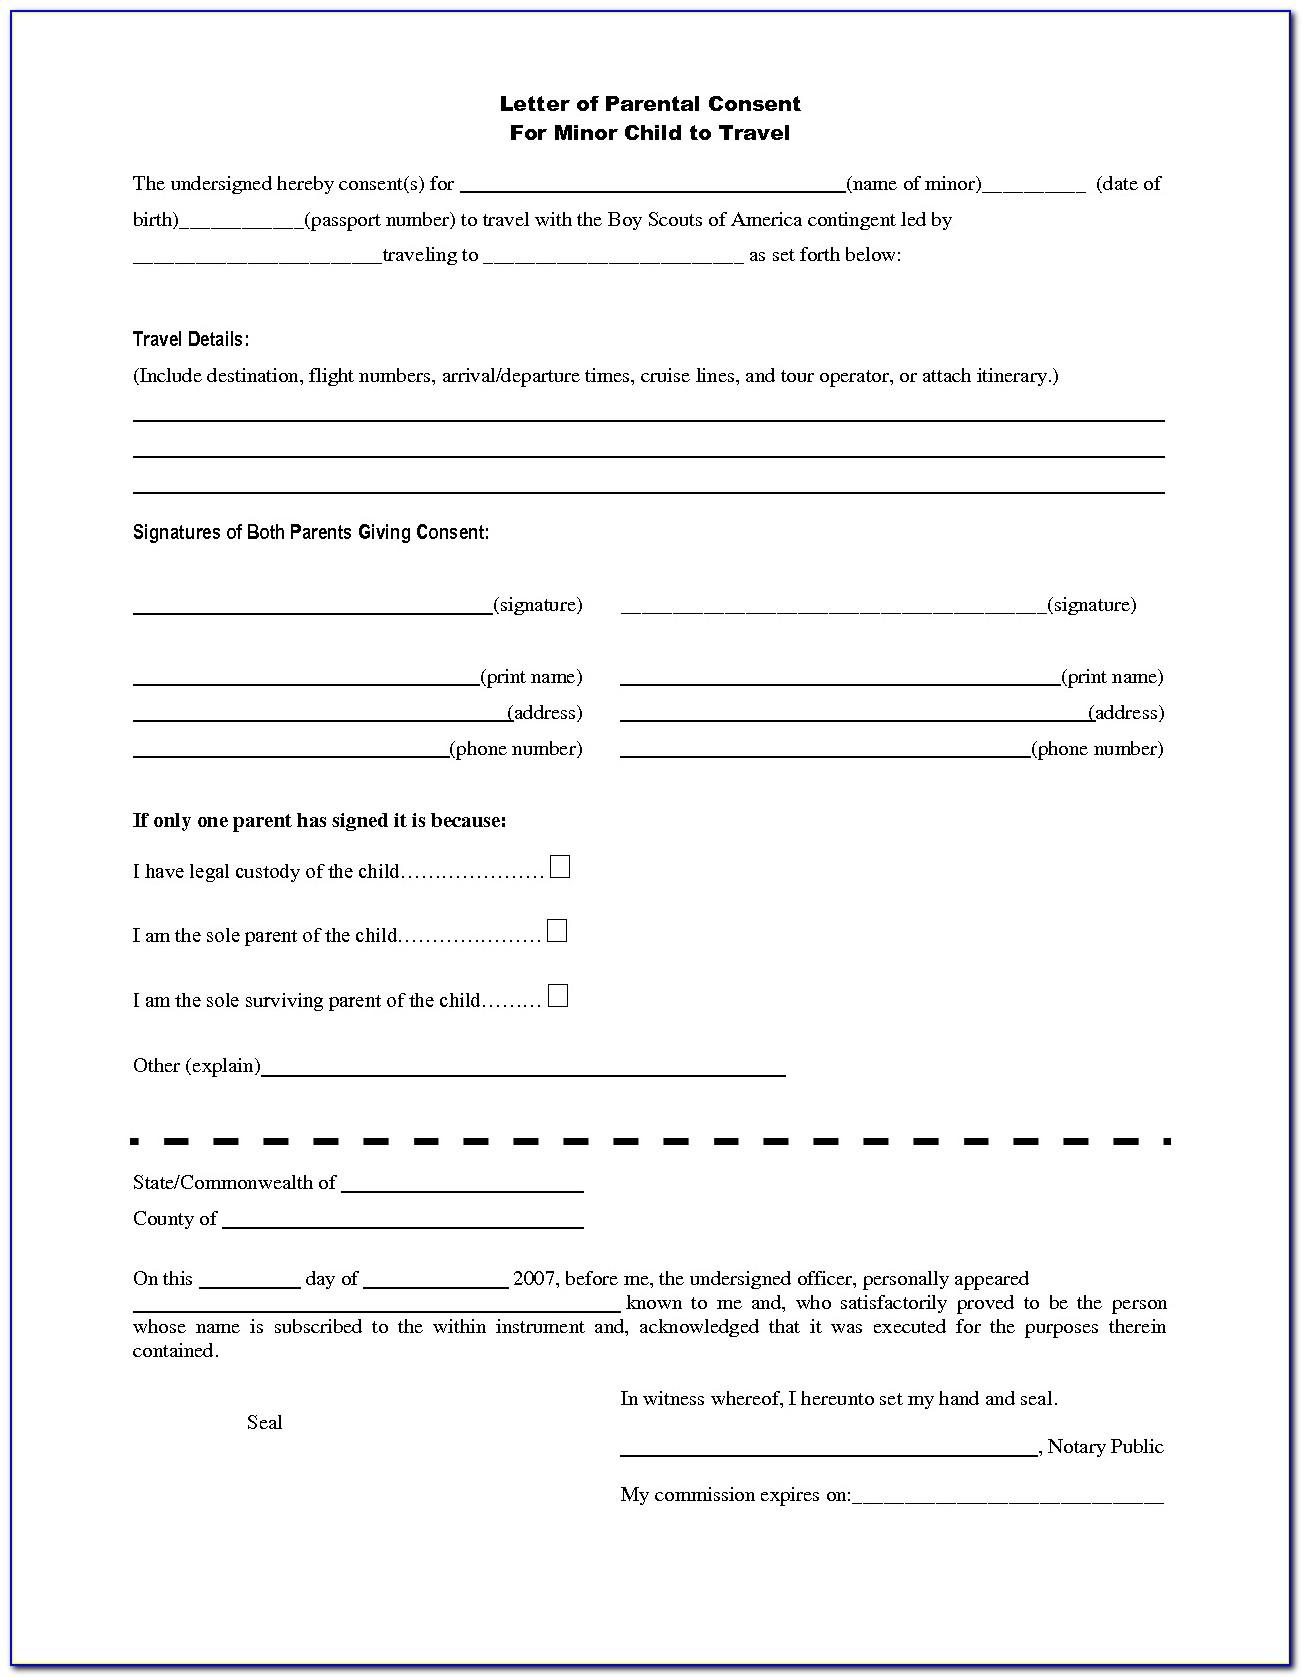 Nigerian Visa Application Form Pdf